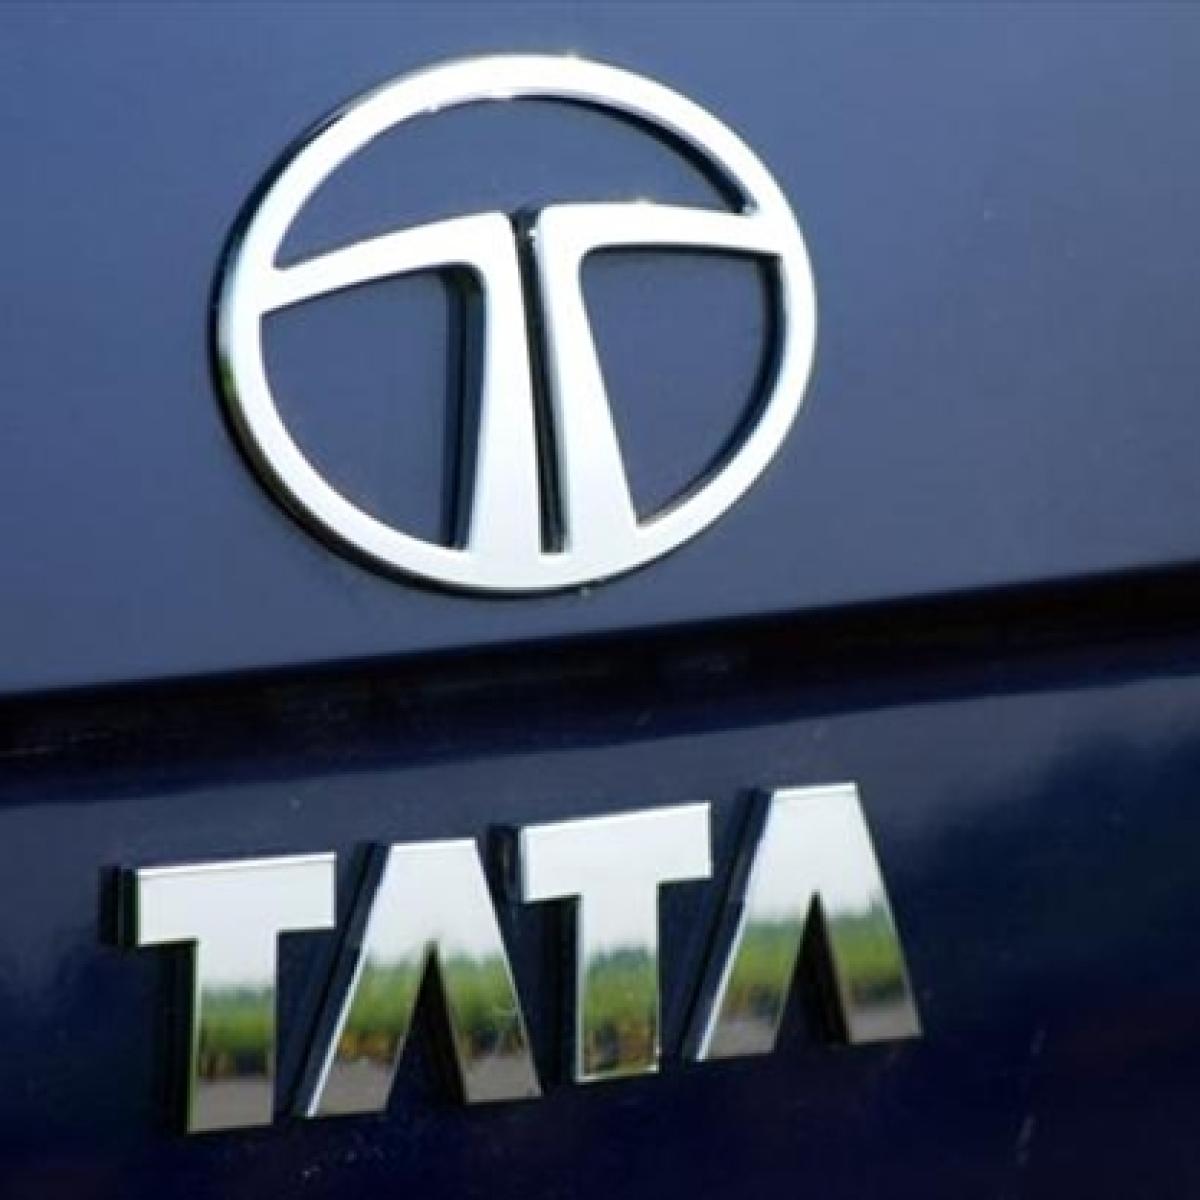 Tata Motors' Q4 FY20 global wholesales down 35% at 2,31,929 units